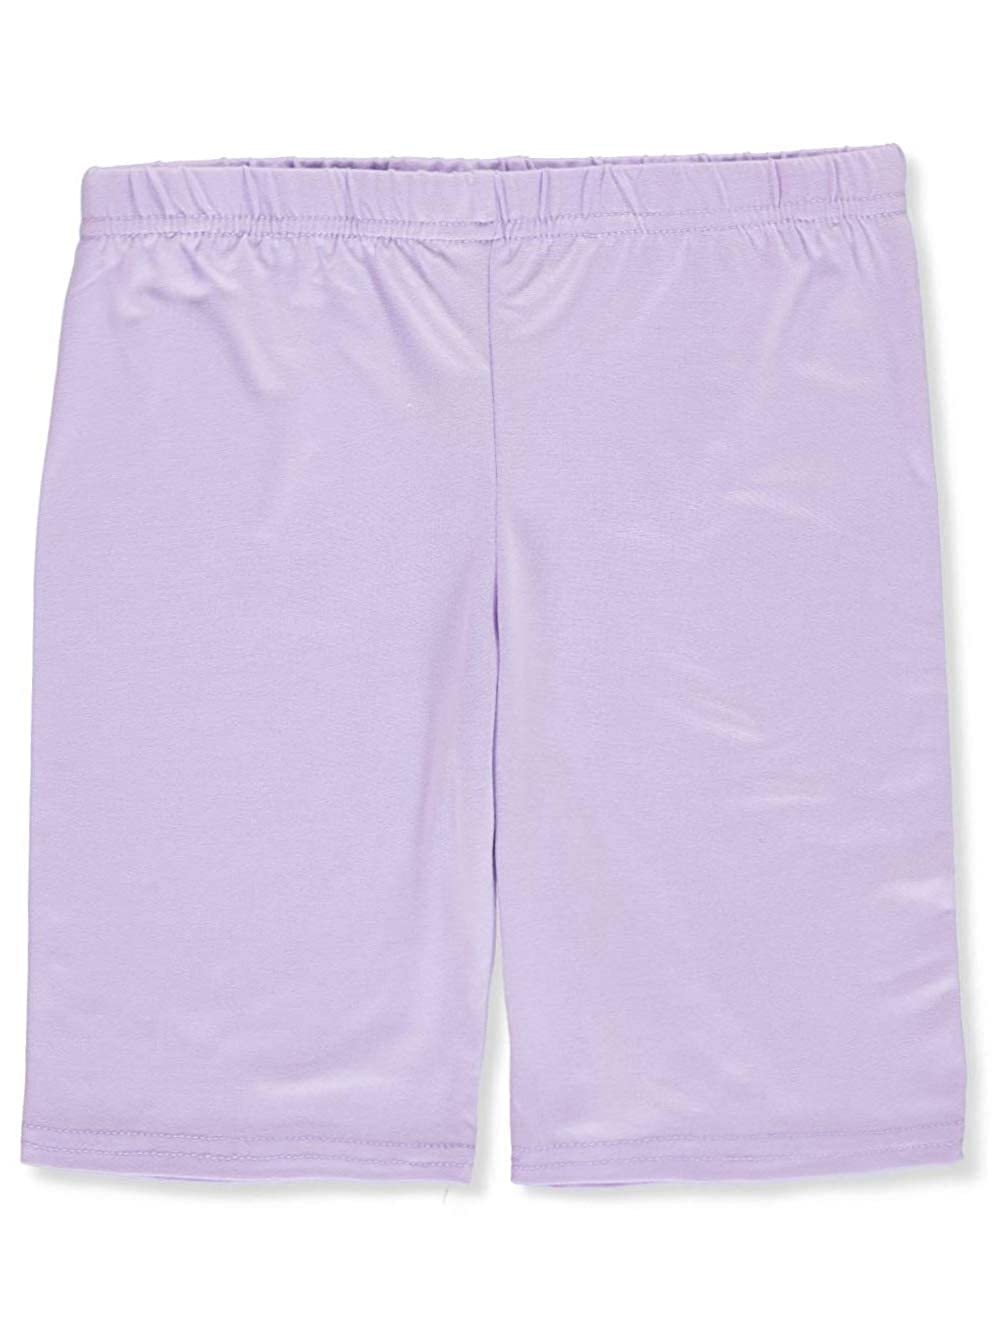 Dream Star Girls Bike Shorts